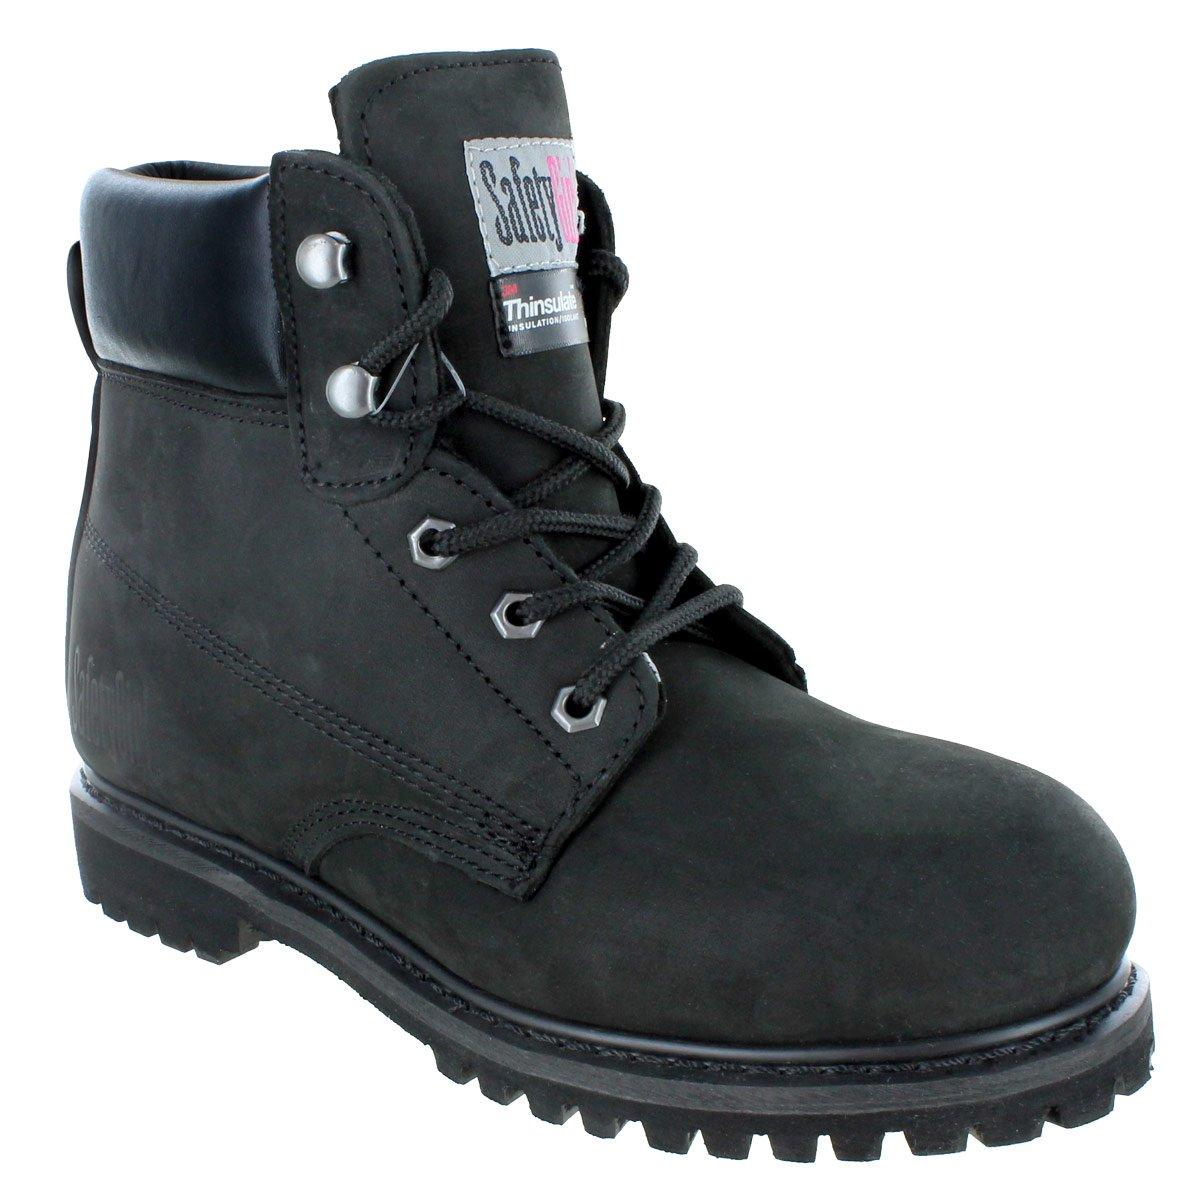 Safety Girl GS005-Black-7M Insulate Work Boot II- Black Steel Toe 7M, English, Capacity, Volume, Leather, 7M, Black ()